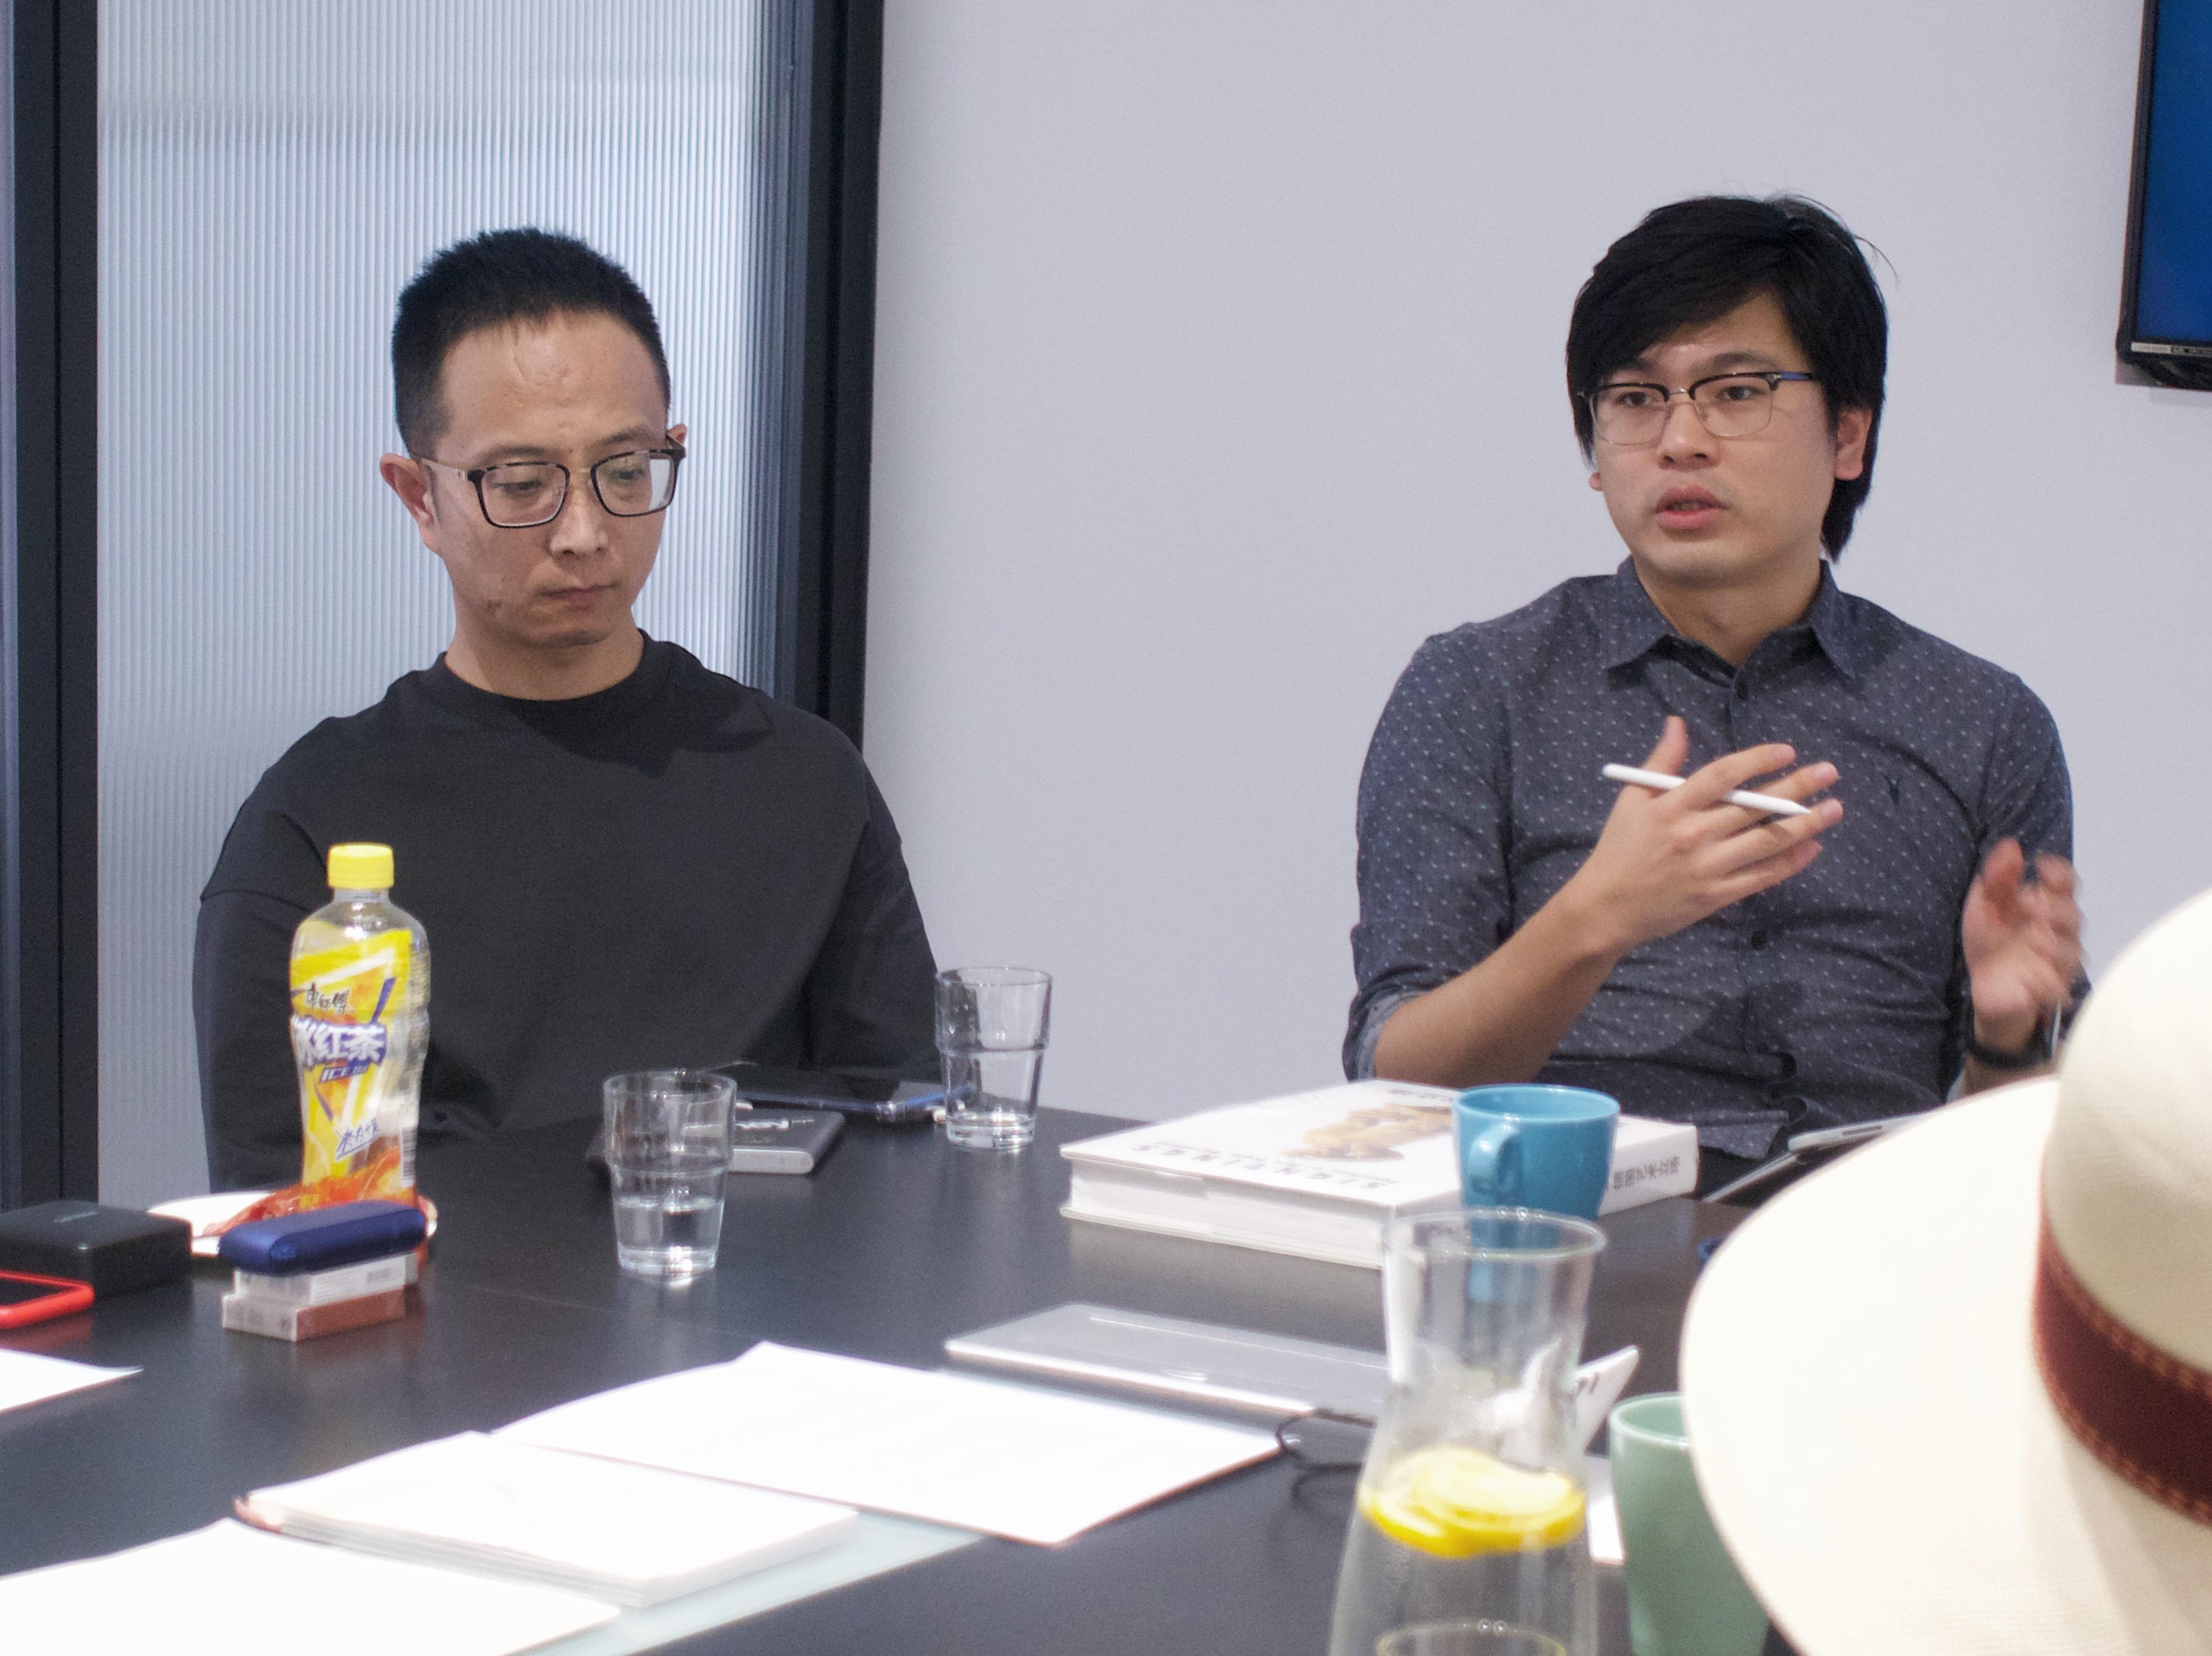 Artist Zheng Da (left) and Gallery Owner TD Yang (right)